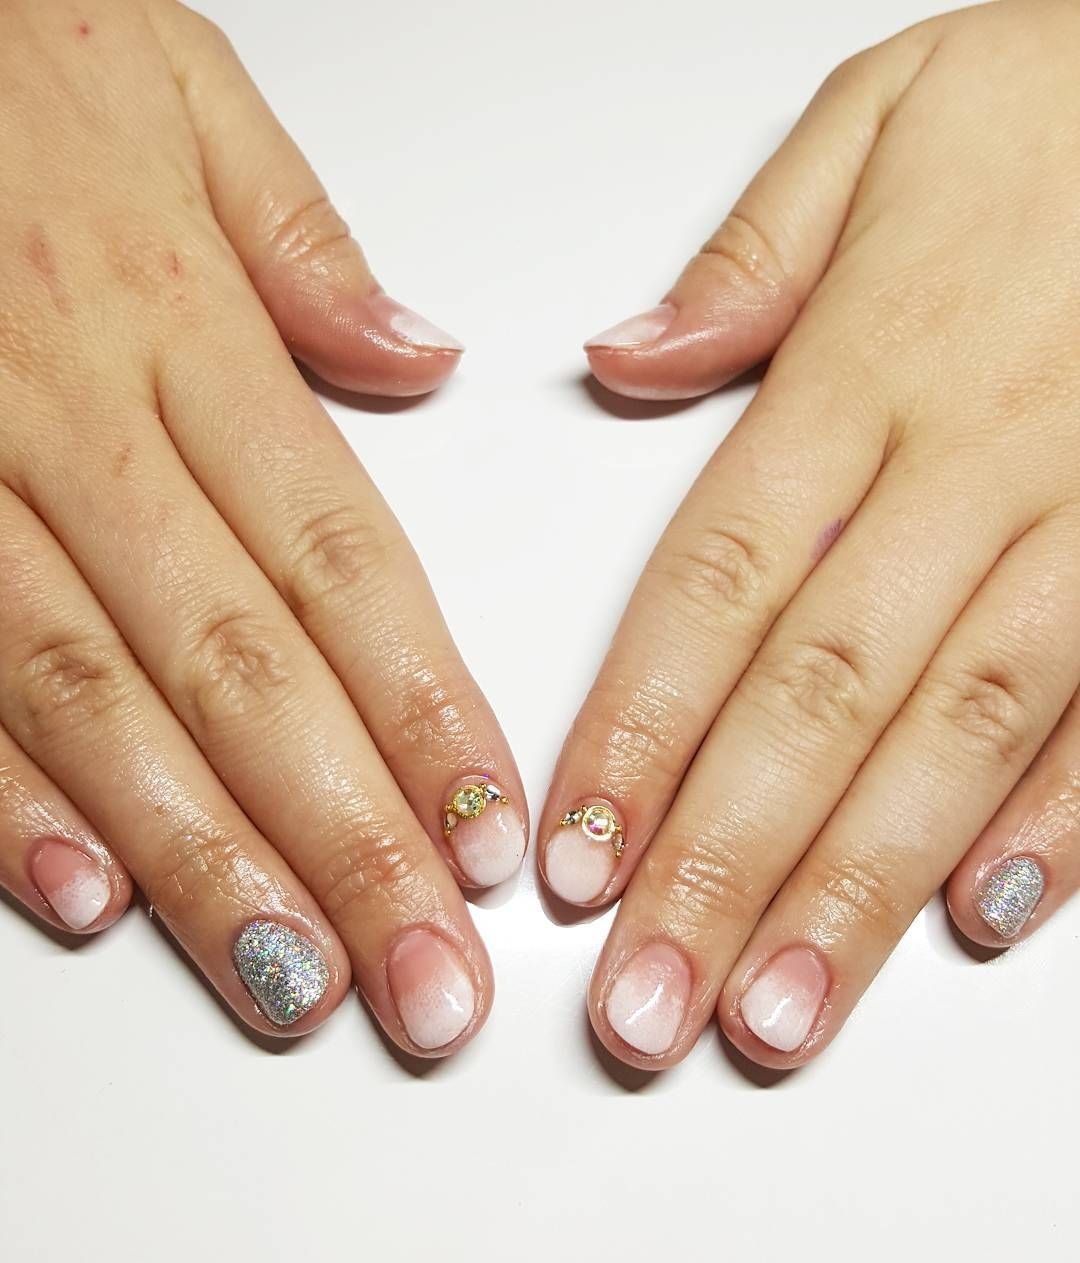 #nailart #ombre #rockstarglitter #gelish #dallasbeautylounge #jewels by dallasbeauty_steph